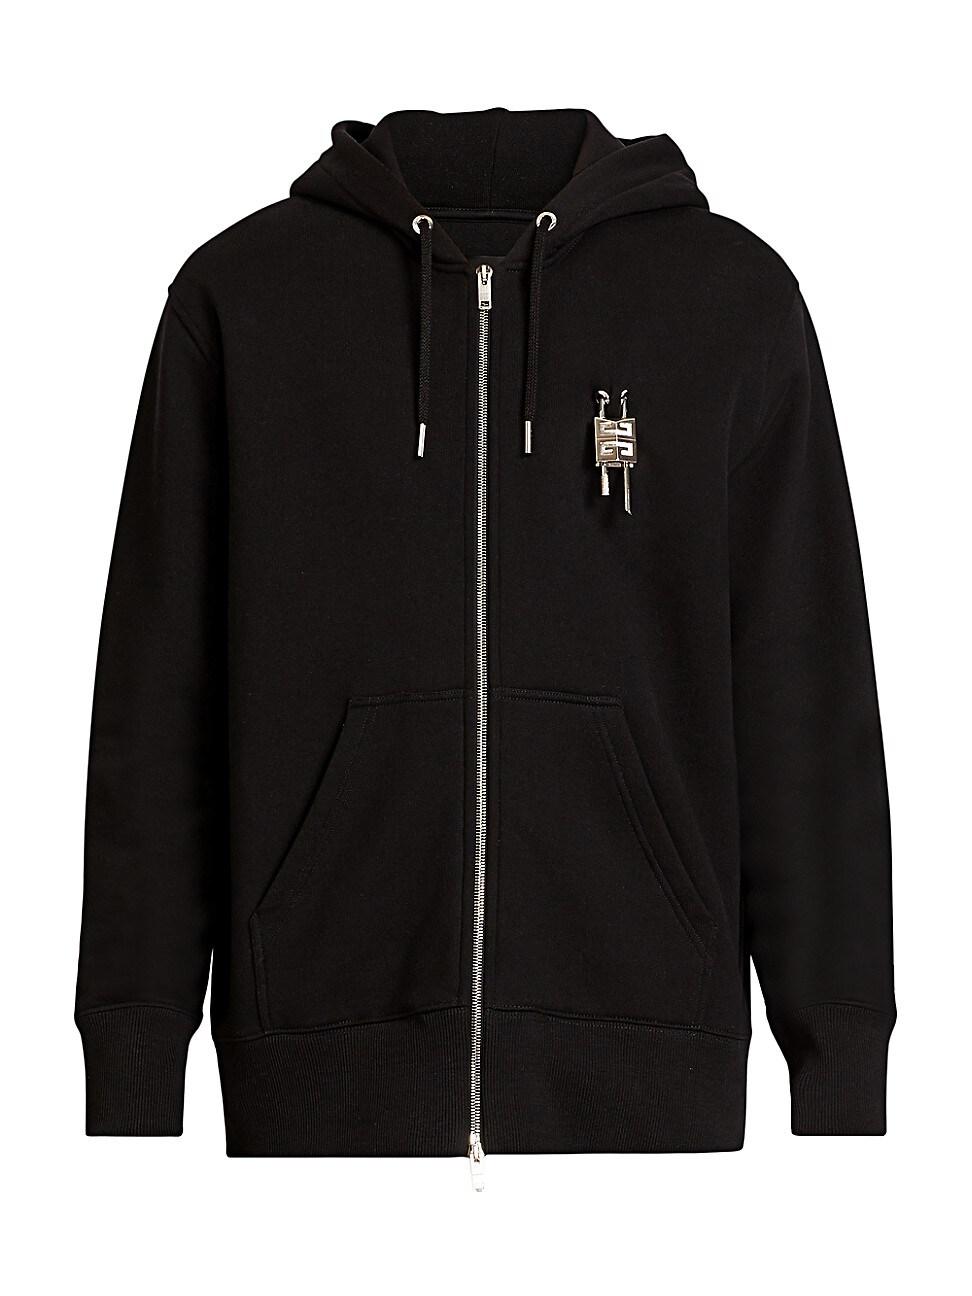 Givenchy Hoodies MEN'S PADLOCK LOGO ZIP-UP HOODIE